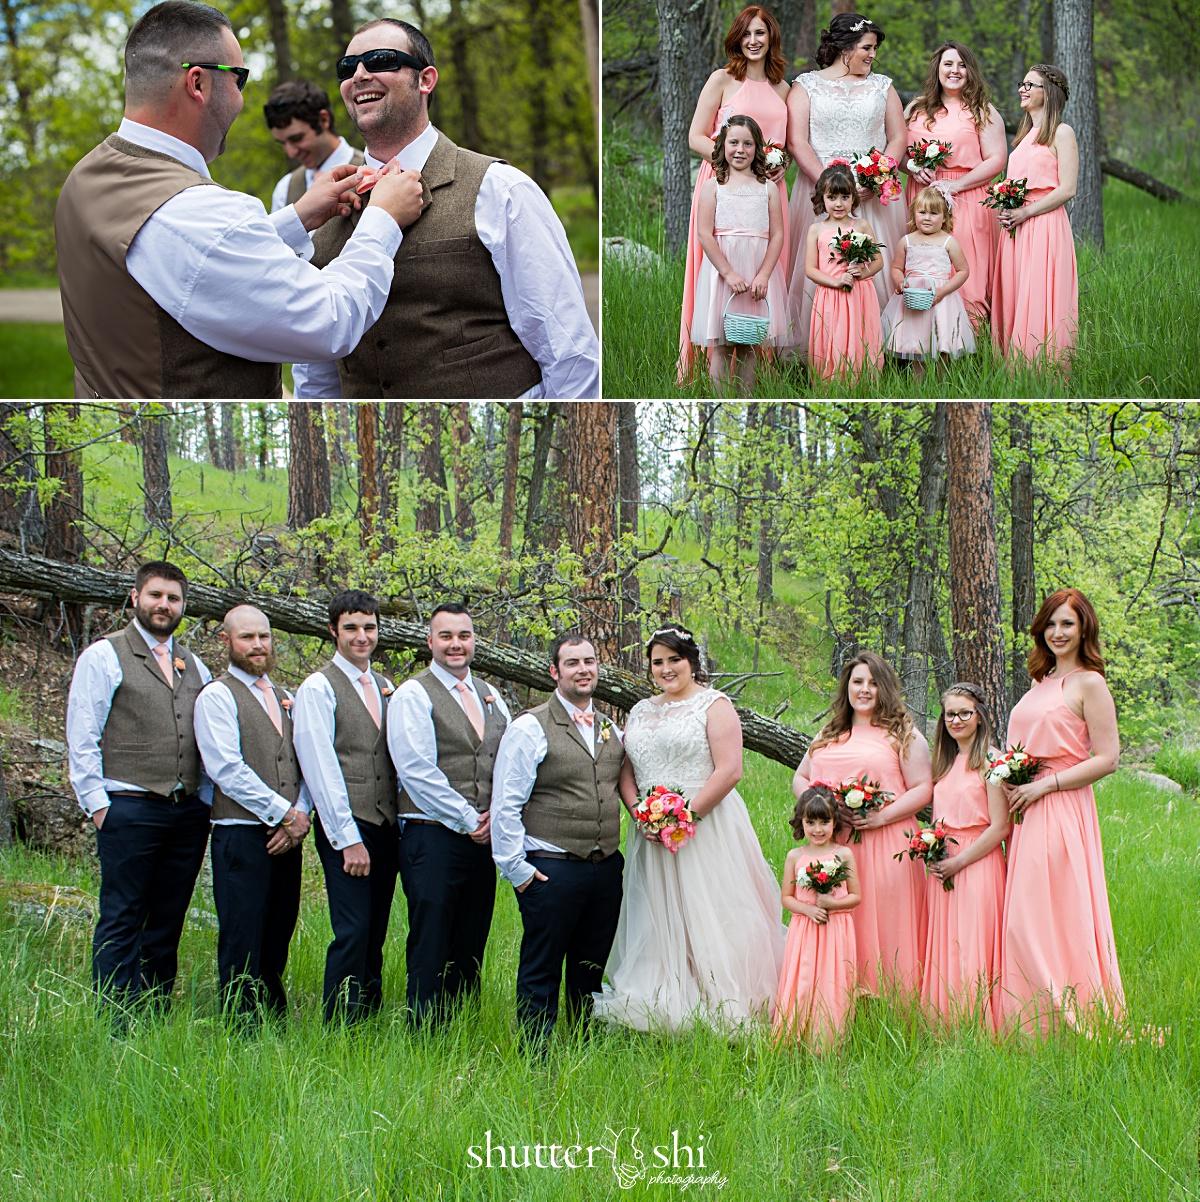 Clint-Tamra-Custer State Park Destination Wedding Spring Blush Pink Dresses Bridal Party South Dakota